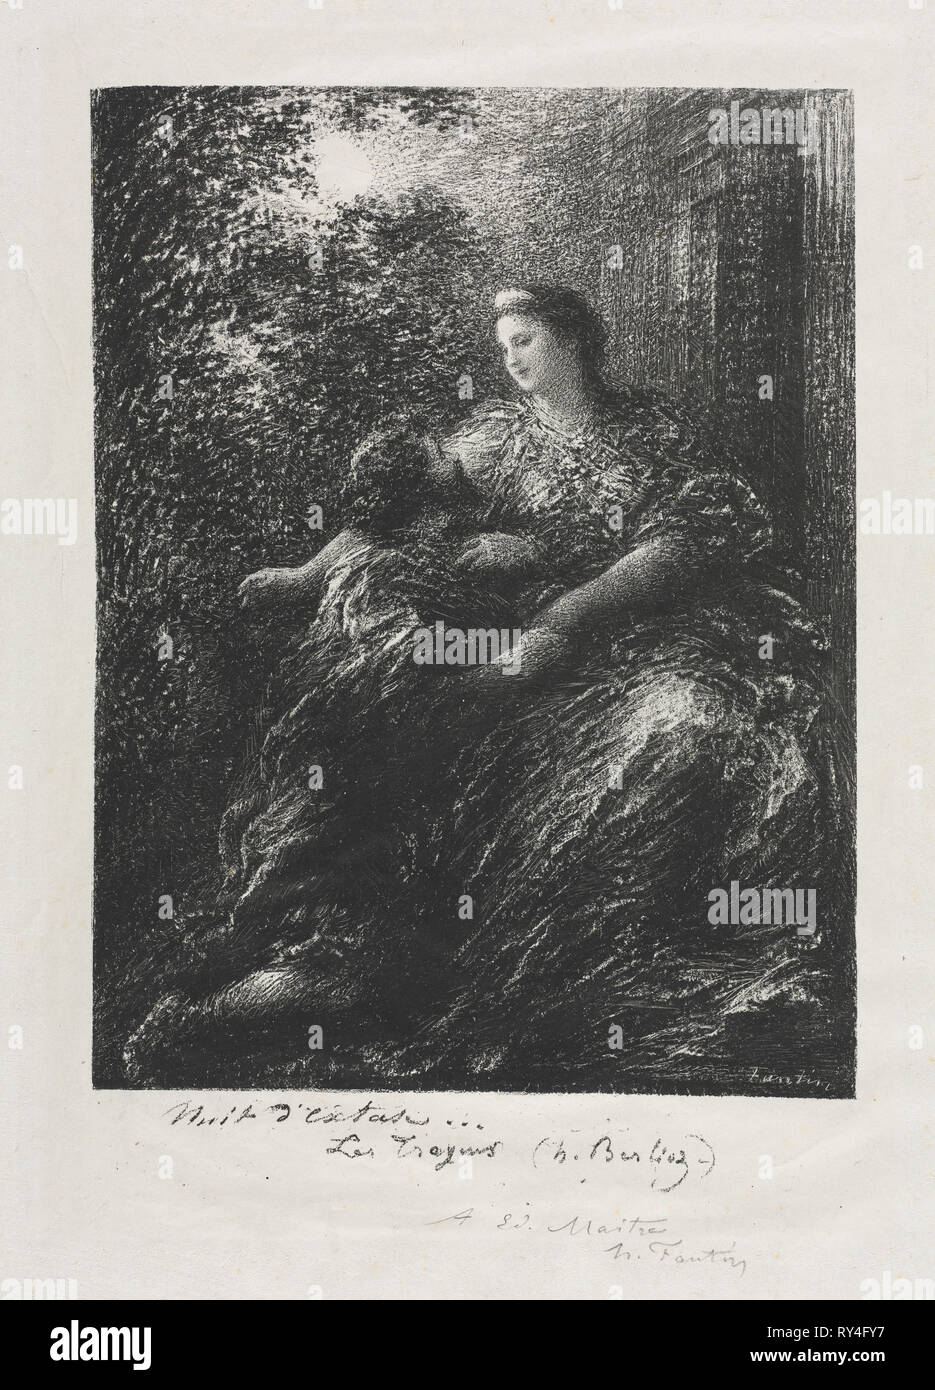 Duet of the Trojans, 1894. Henri Fantin-Latour (French, 1836-1904). Lithograph - Stock Image